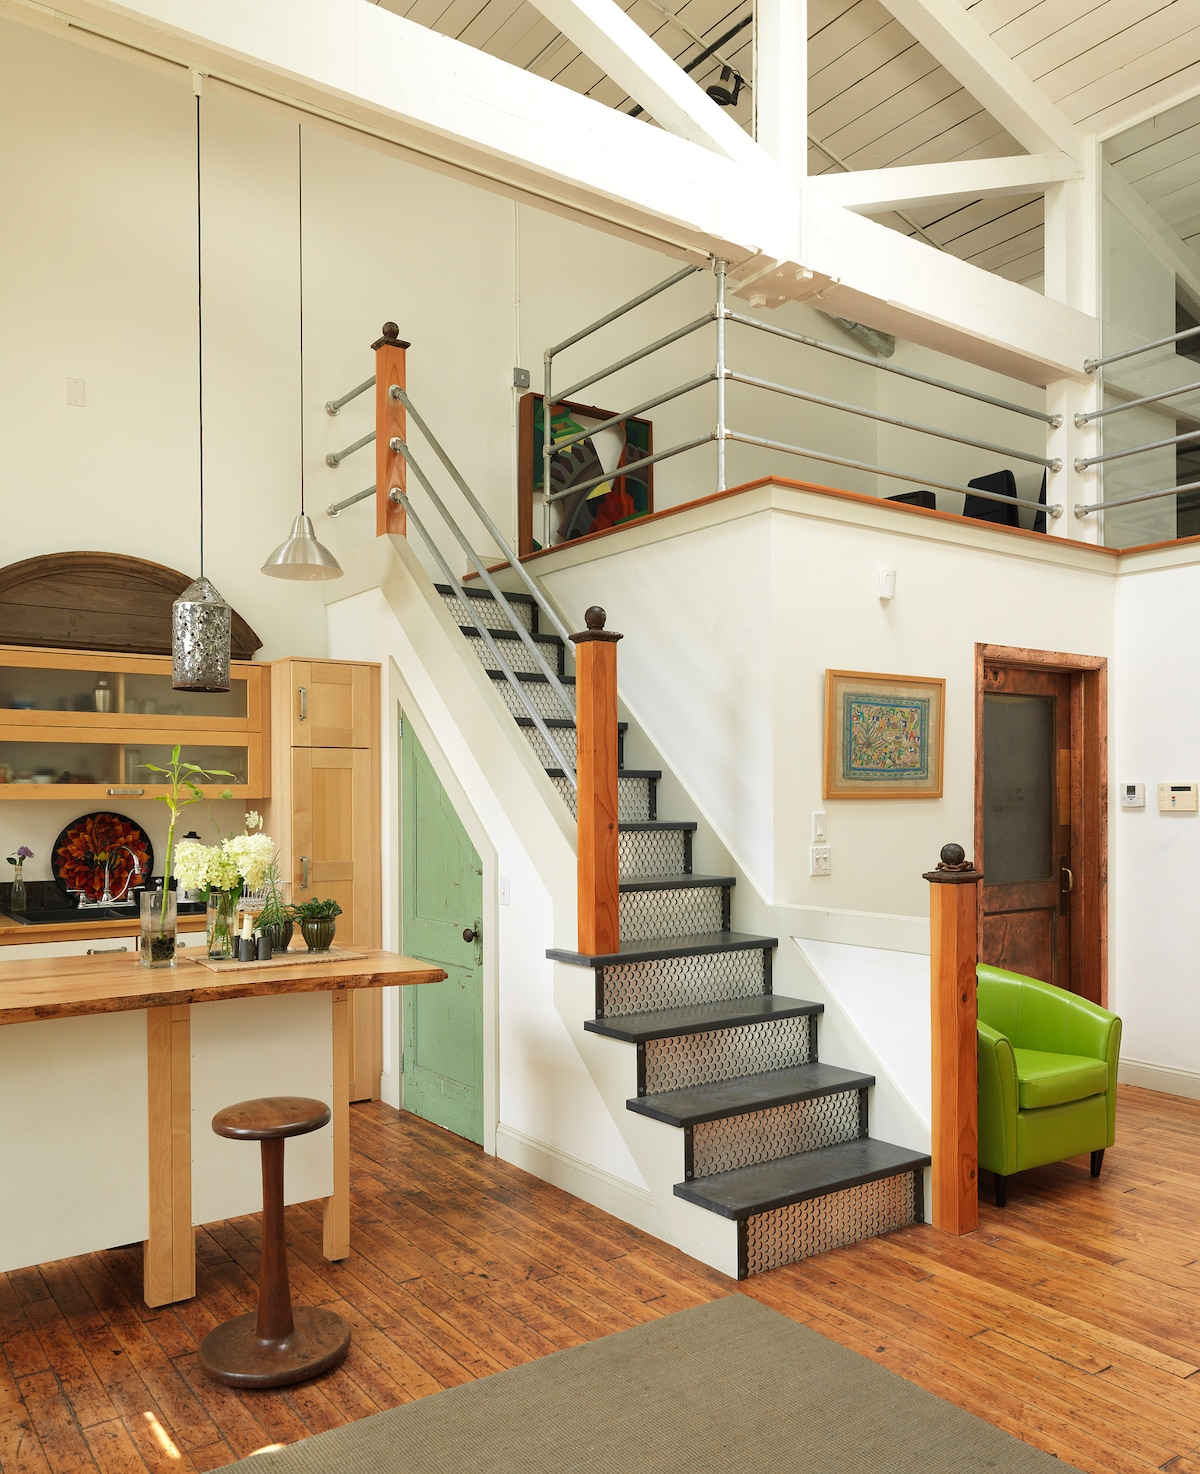 Urban Loft in Creative Community